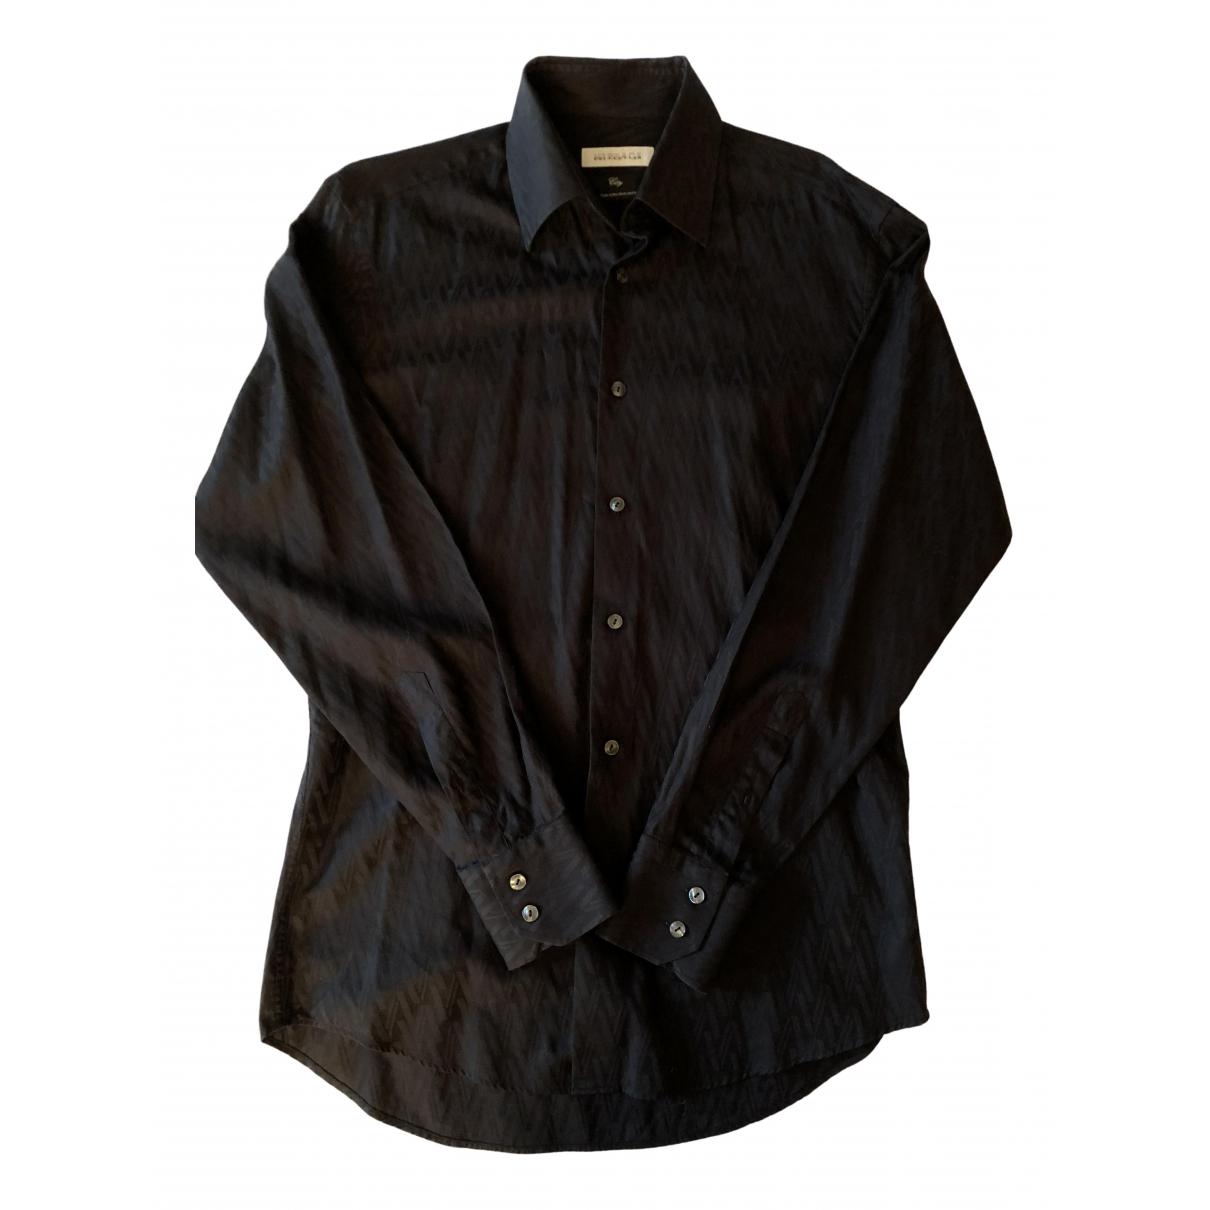 Versace N Black Cotton Shirts for Men 38 EU (tour de cou / collar)